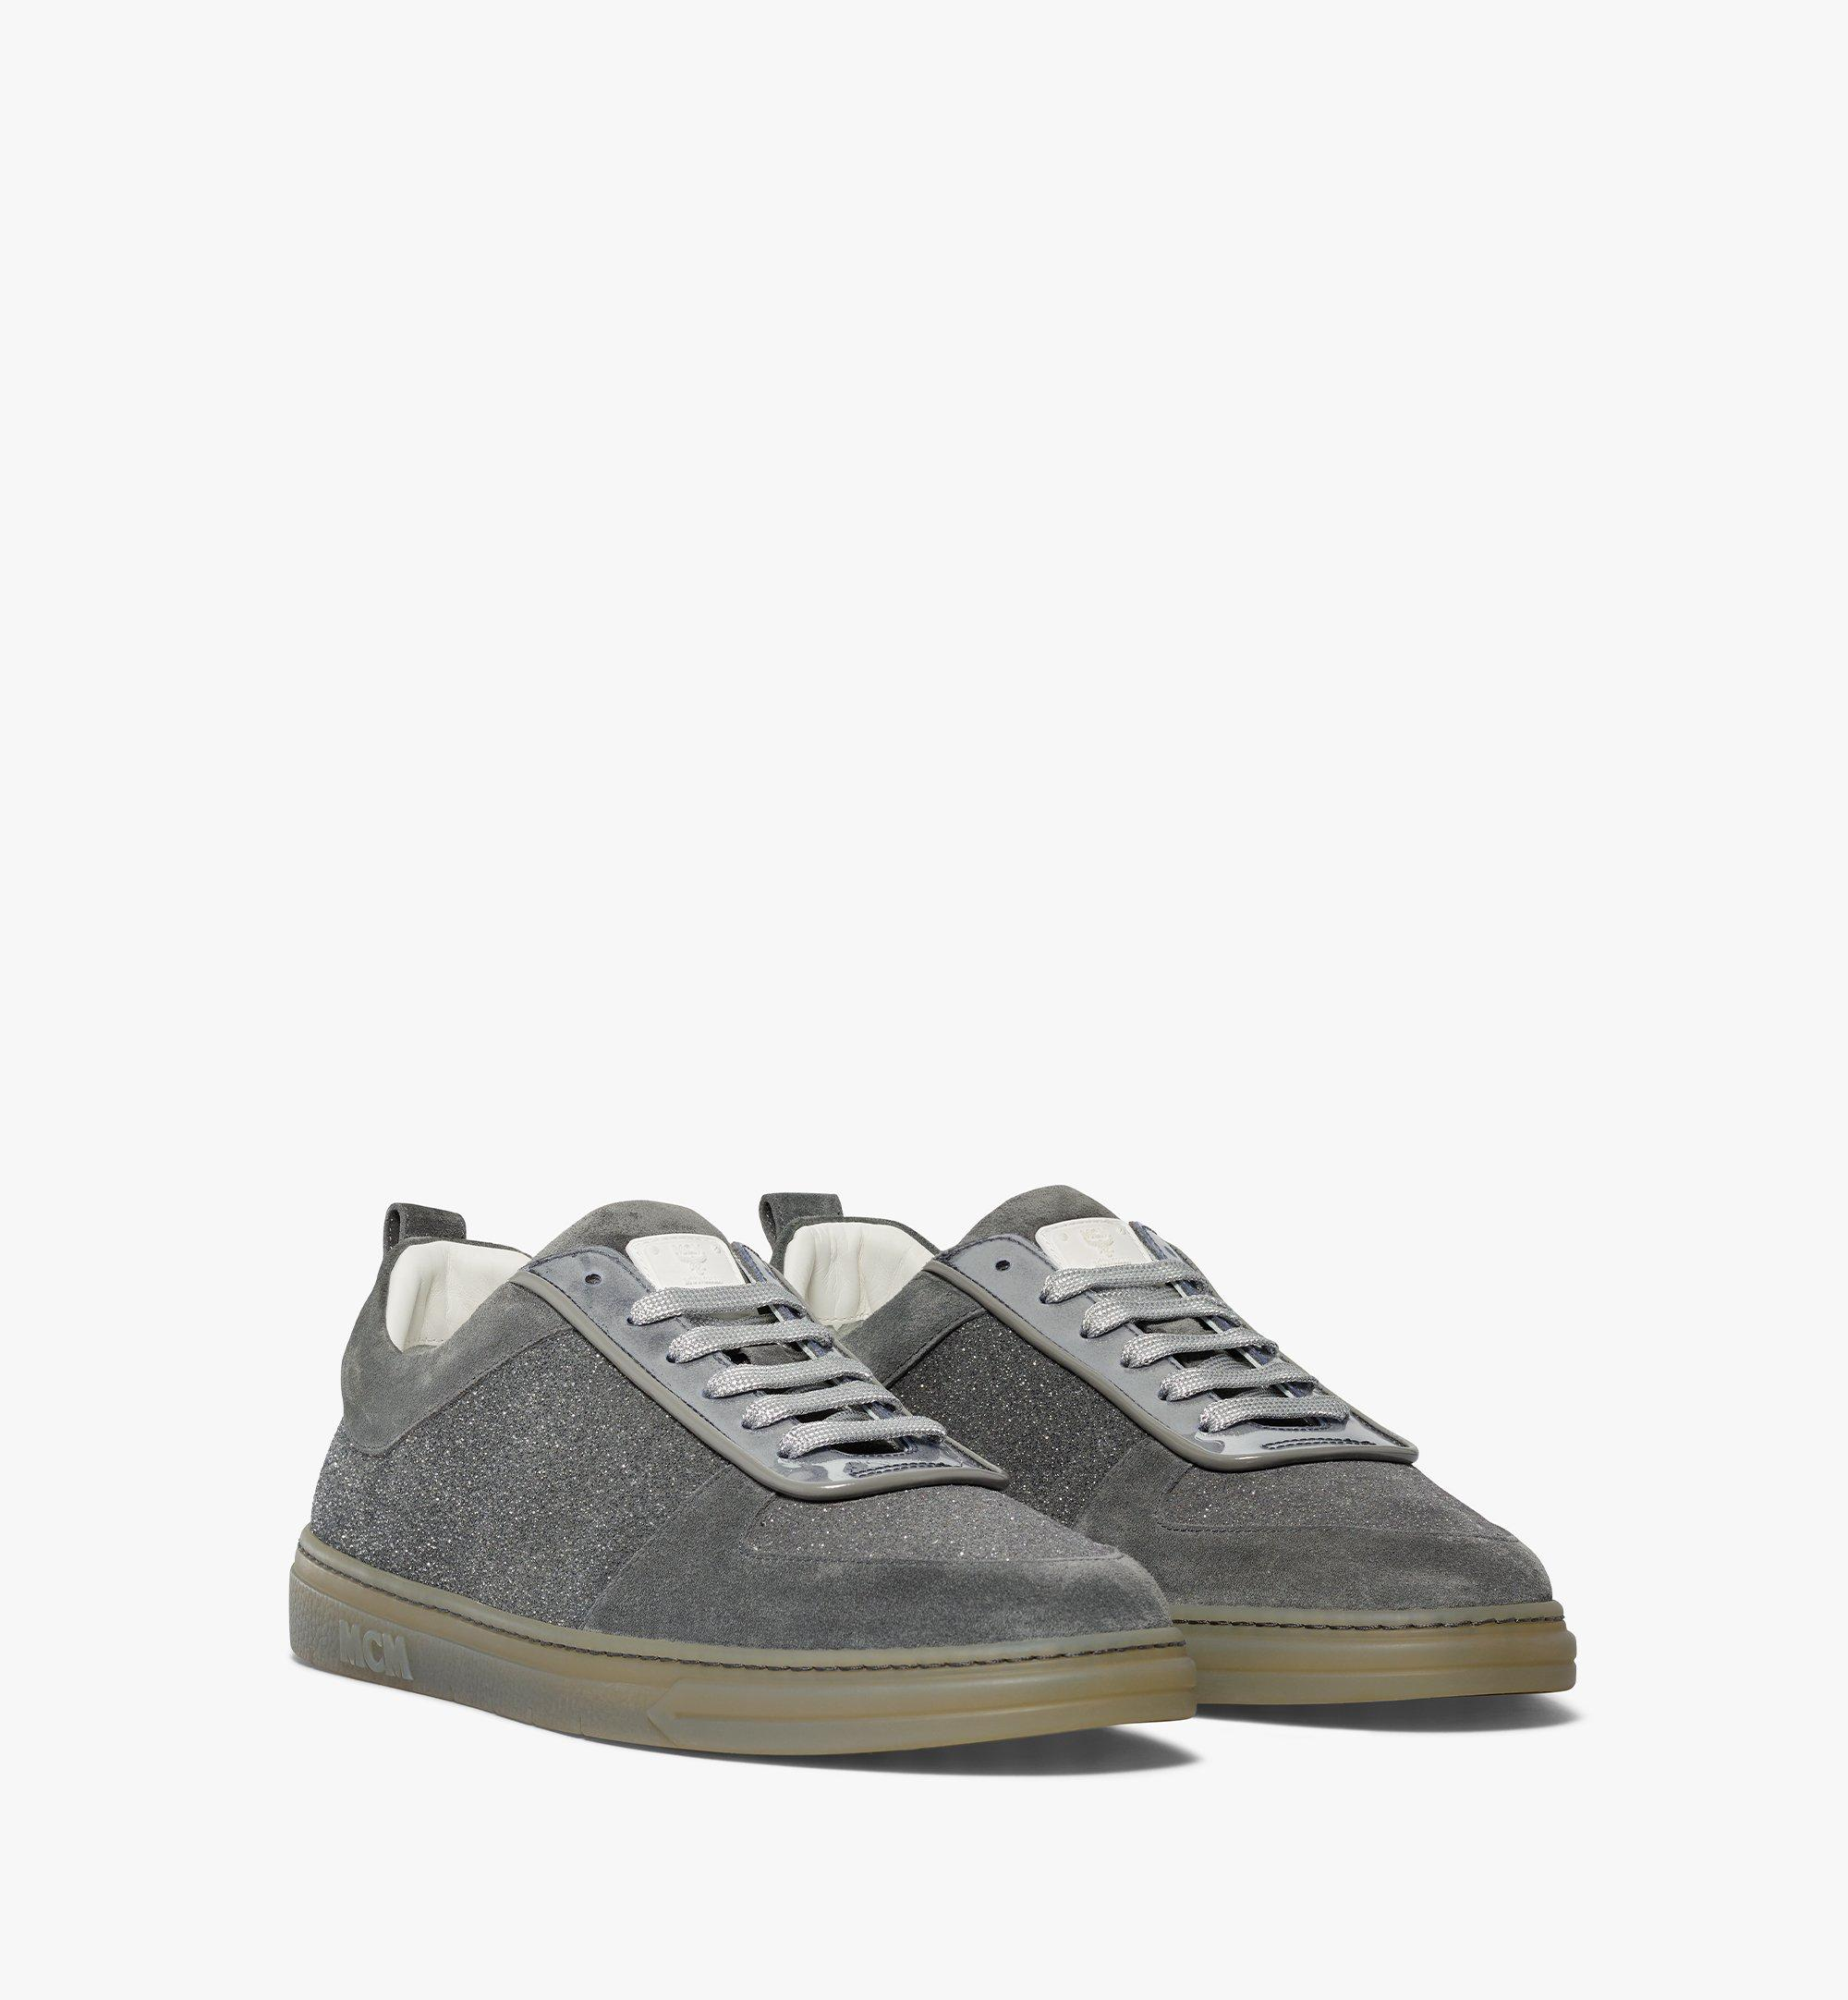 MCM Men's Terrain Lo Sneakers in Multi-Suede Leather Grey MEXBSMM06EO041 Alternate View 1